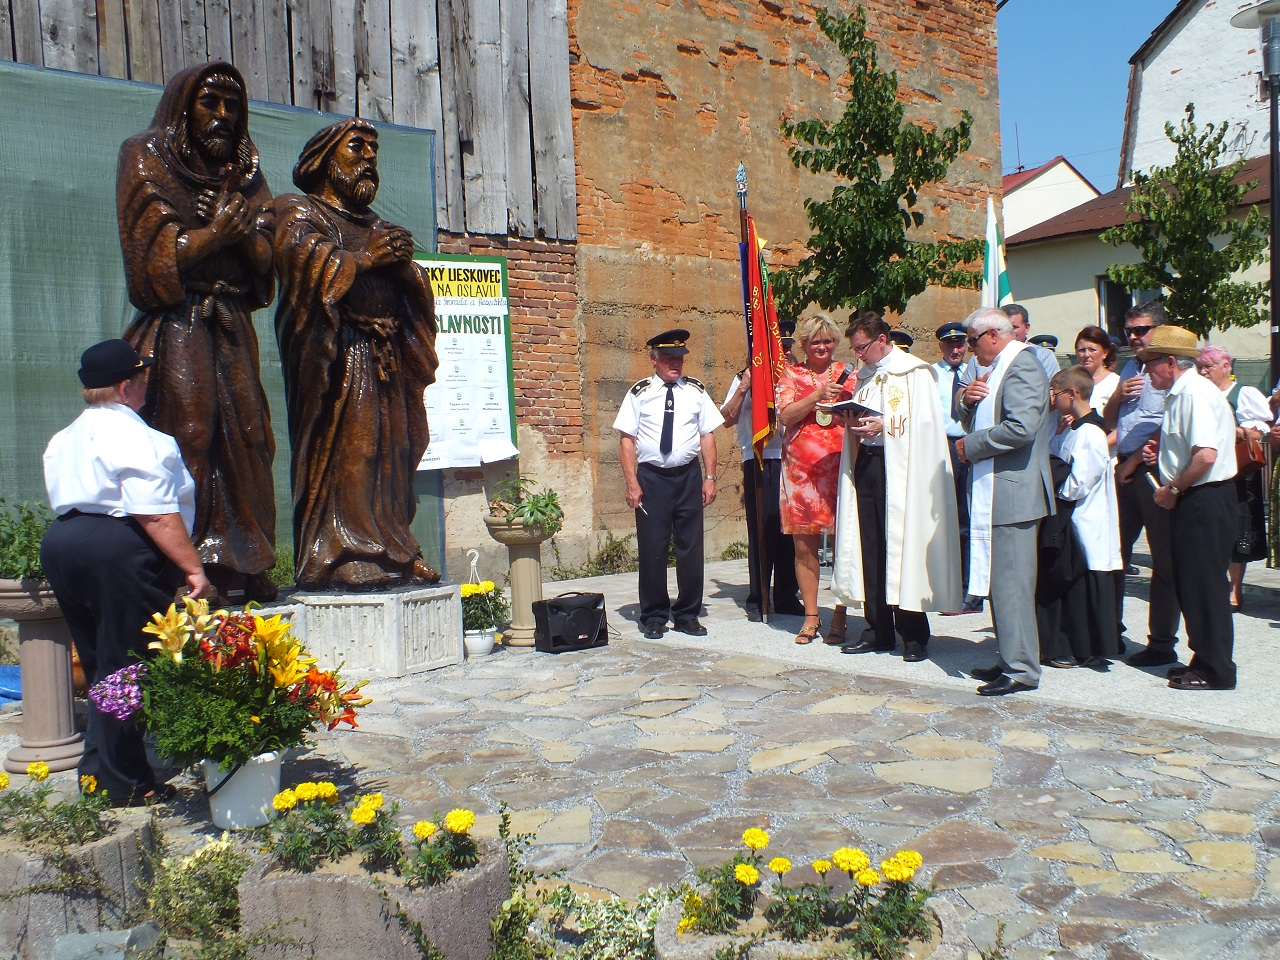 Súsošie sv. Svorada Andreja a Benedikta